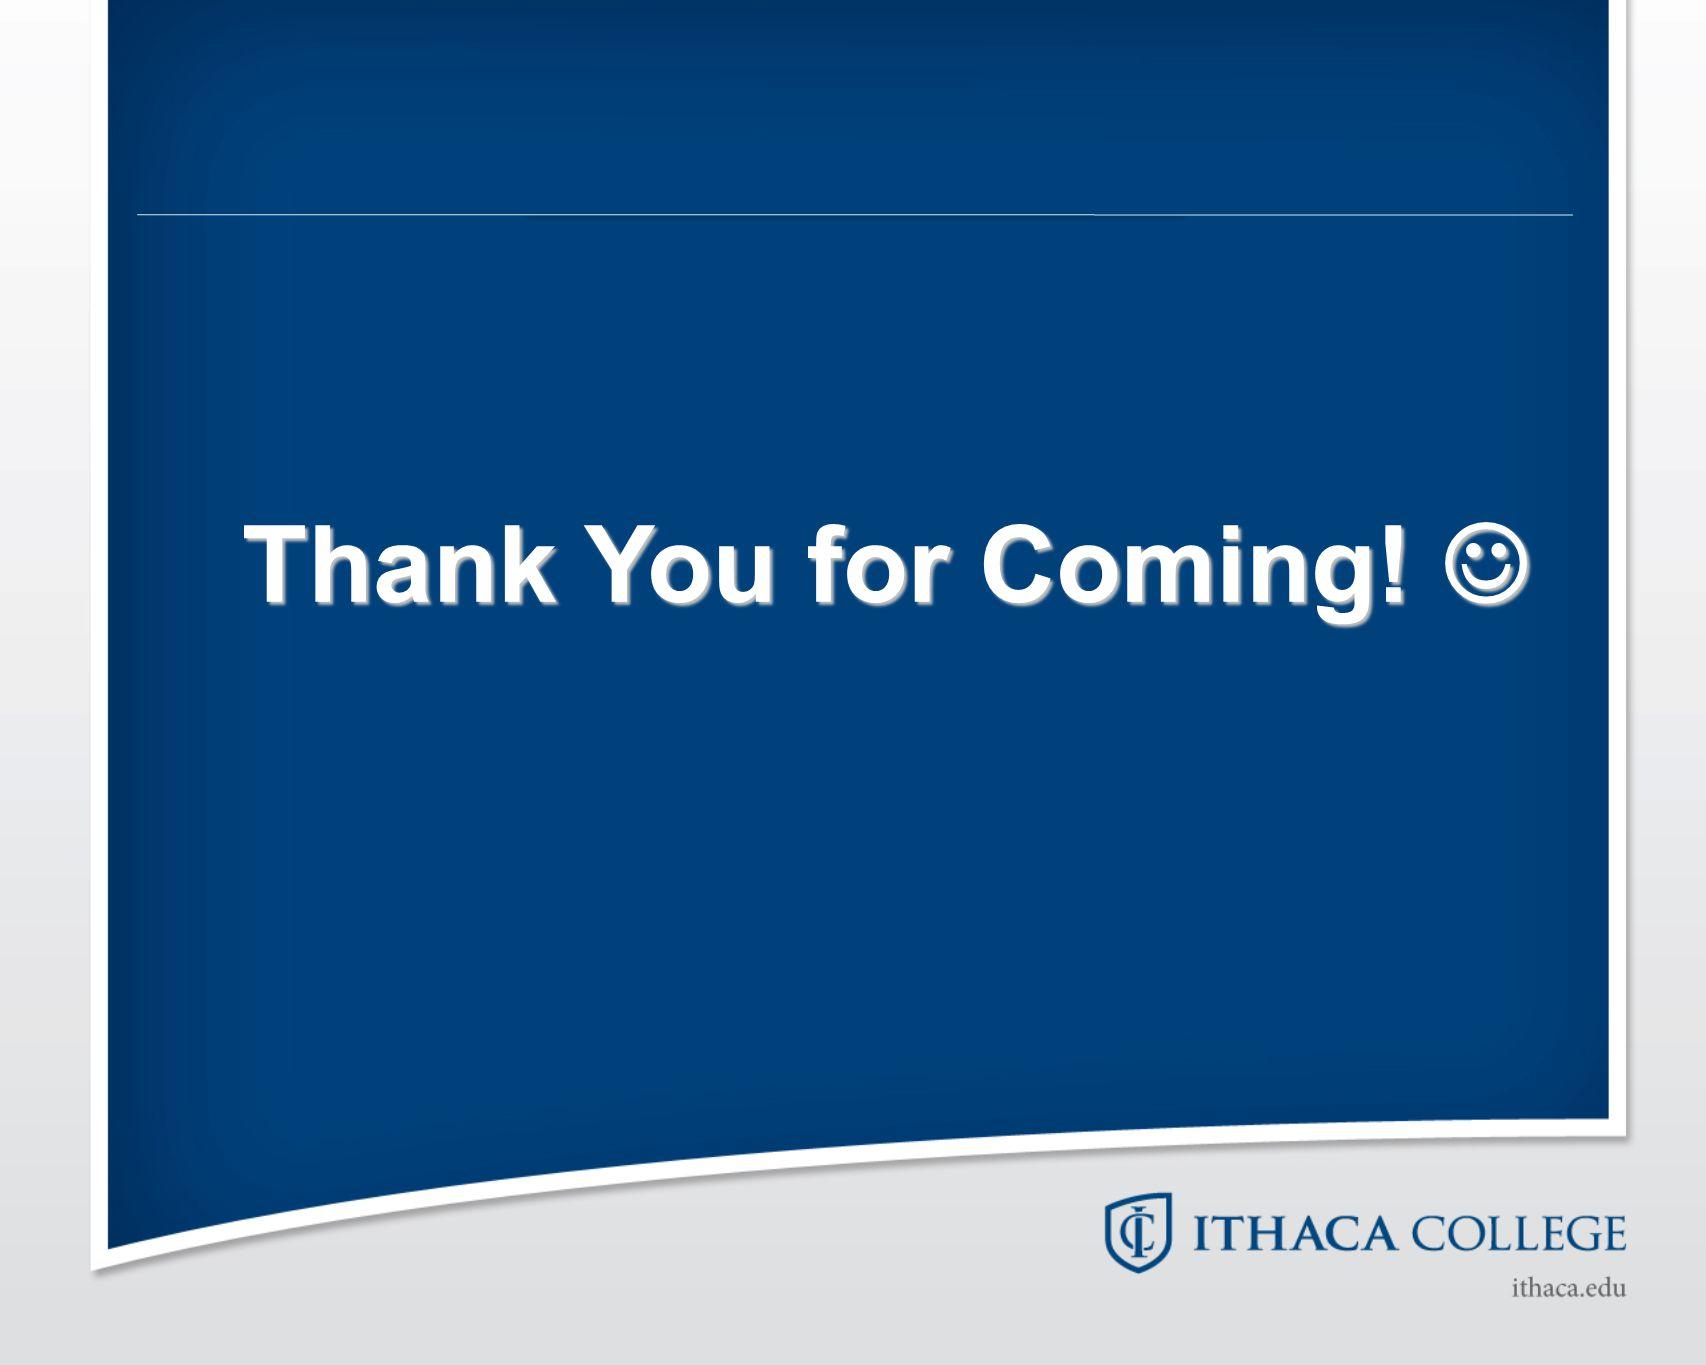 Thank You for Coming! Thank You for Coming!